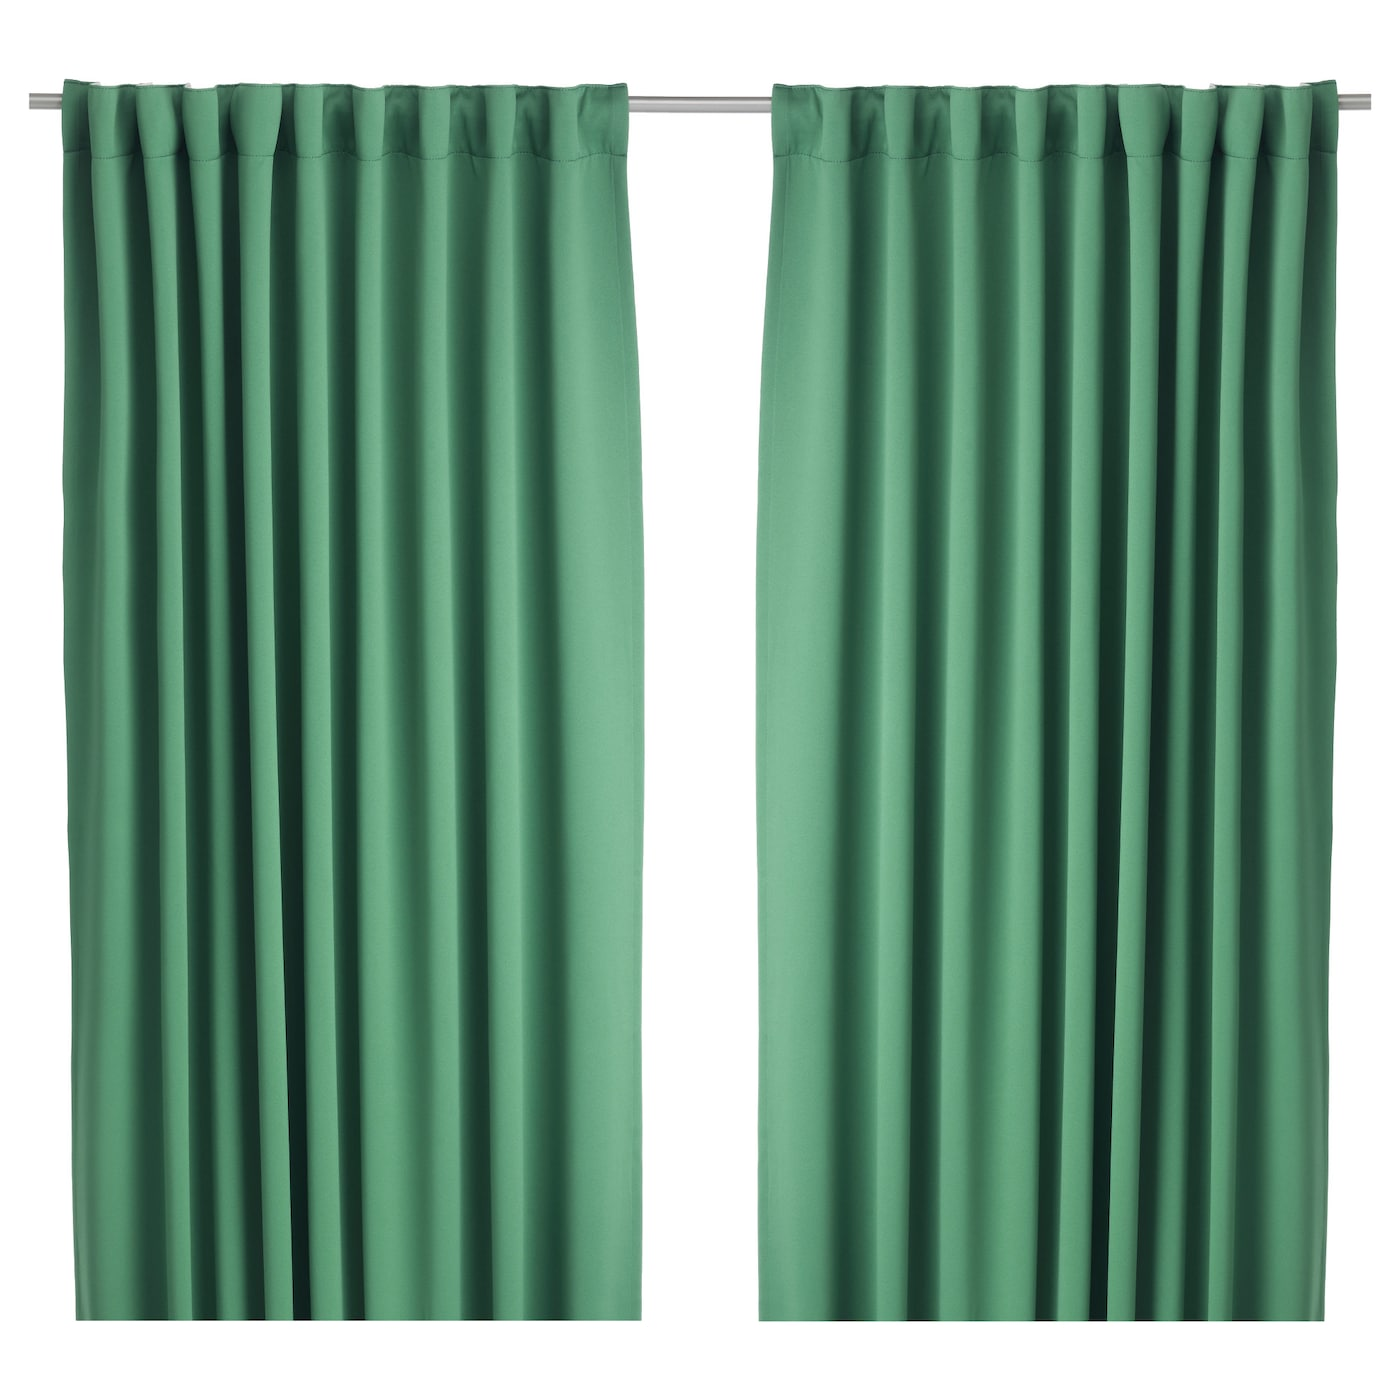 Werna Block Out Curtains 1 Pair Green 145x300 Cm Ikea